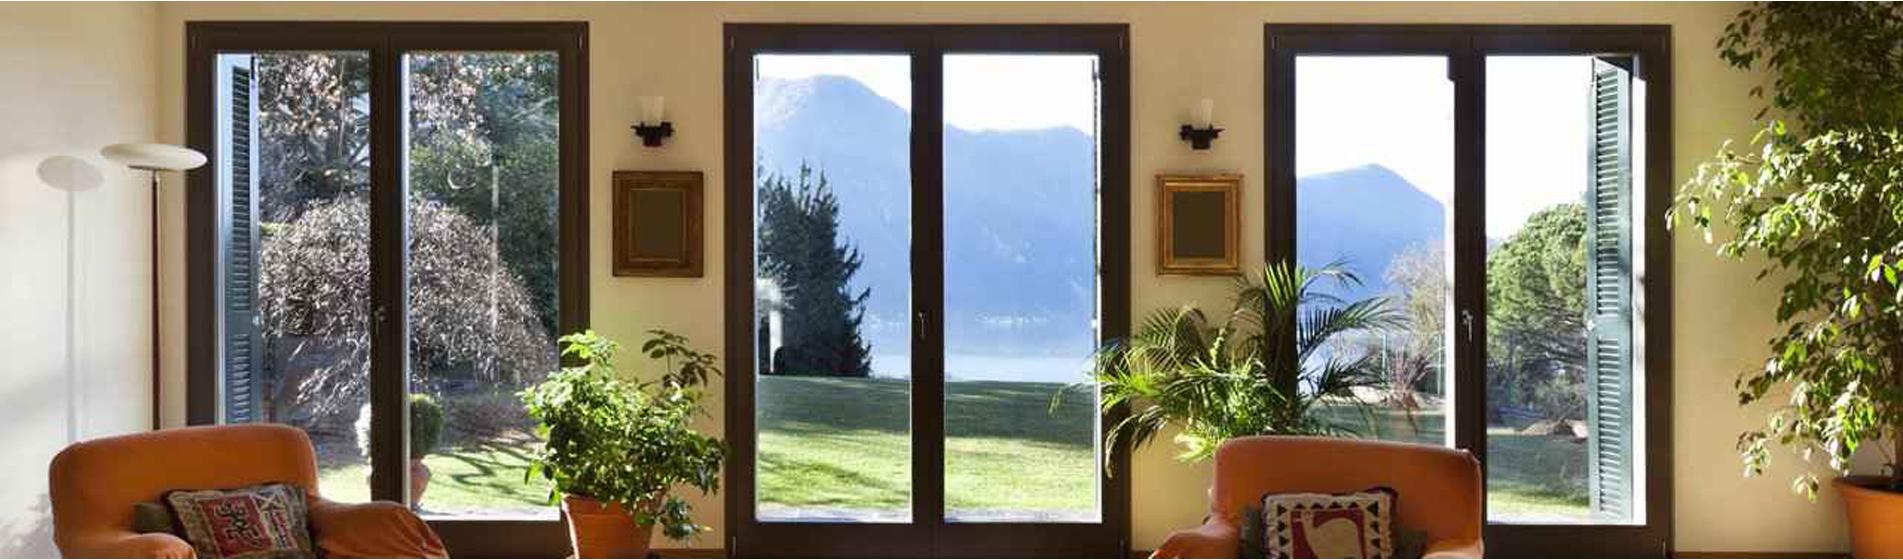 installer fenêtre alu sur-mesure 30 Gard